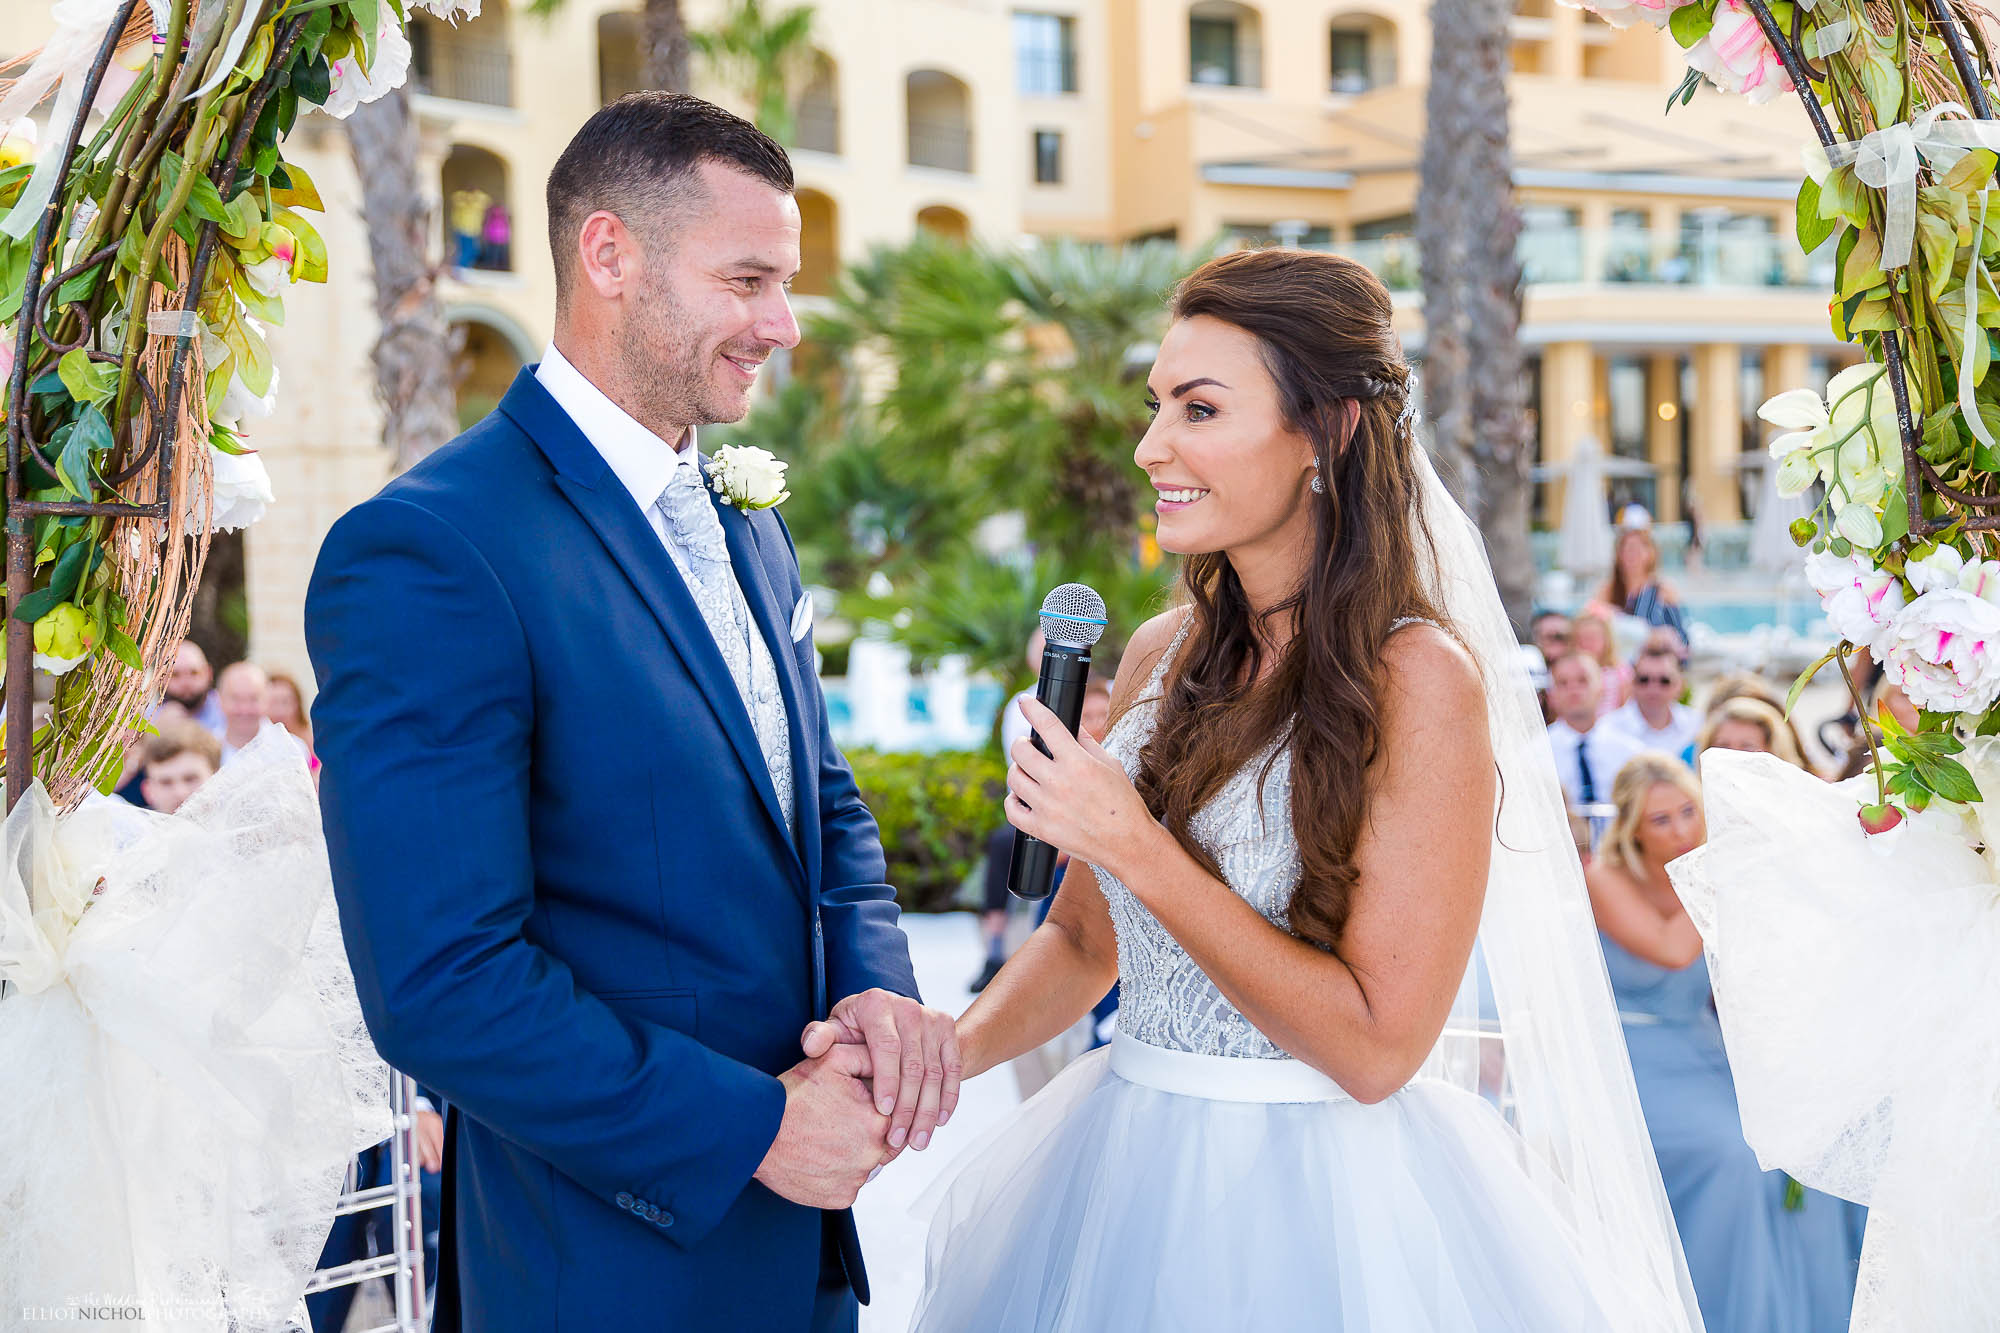 Bride says her vows during her destination wedding civil ceremony. Wedding photography by Elliot Nichol.